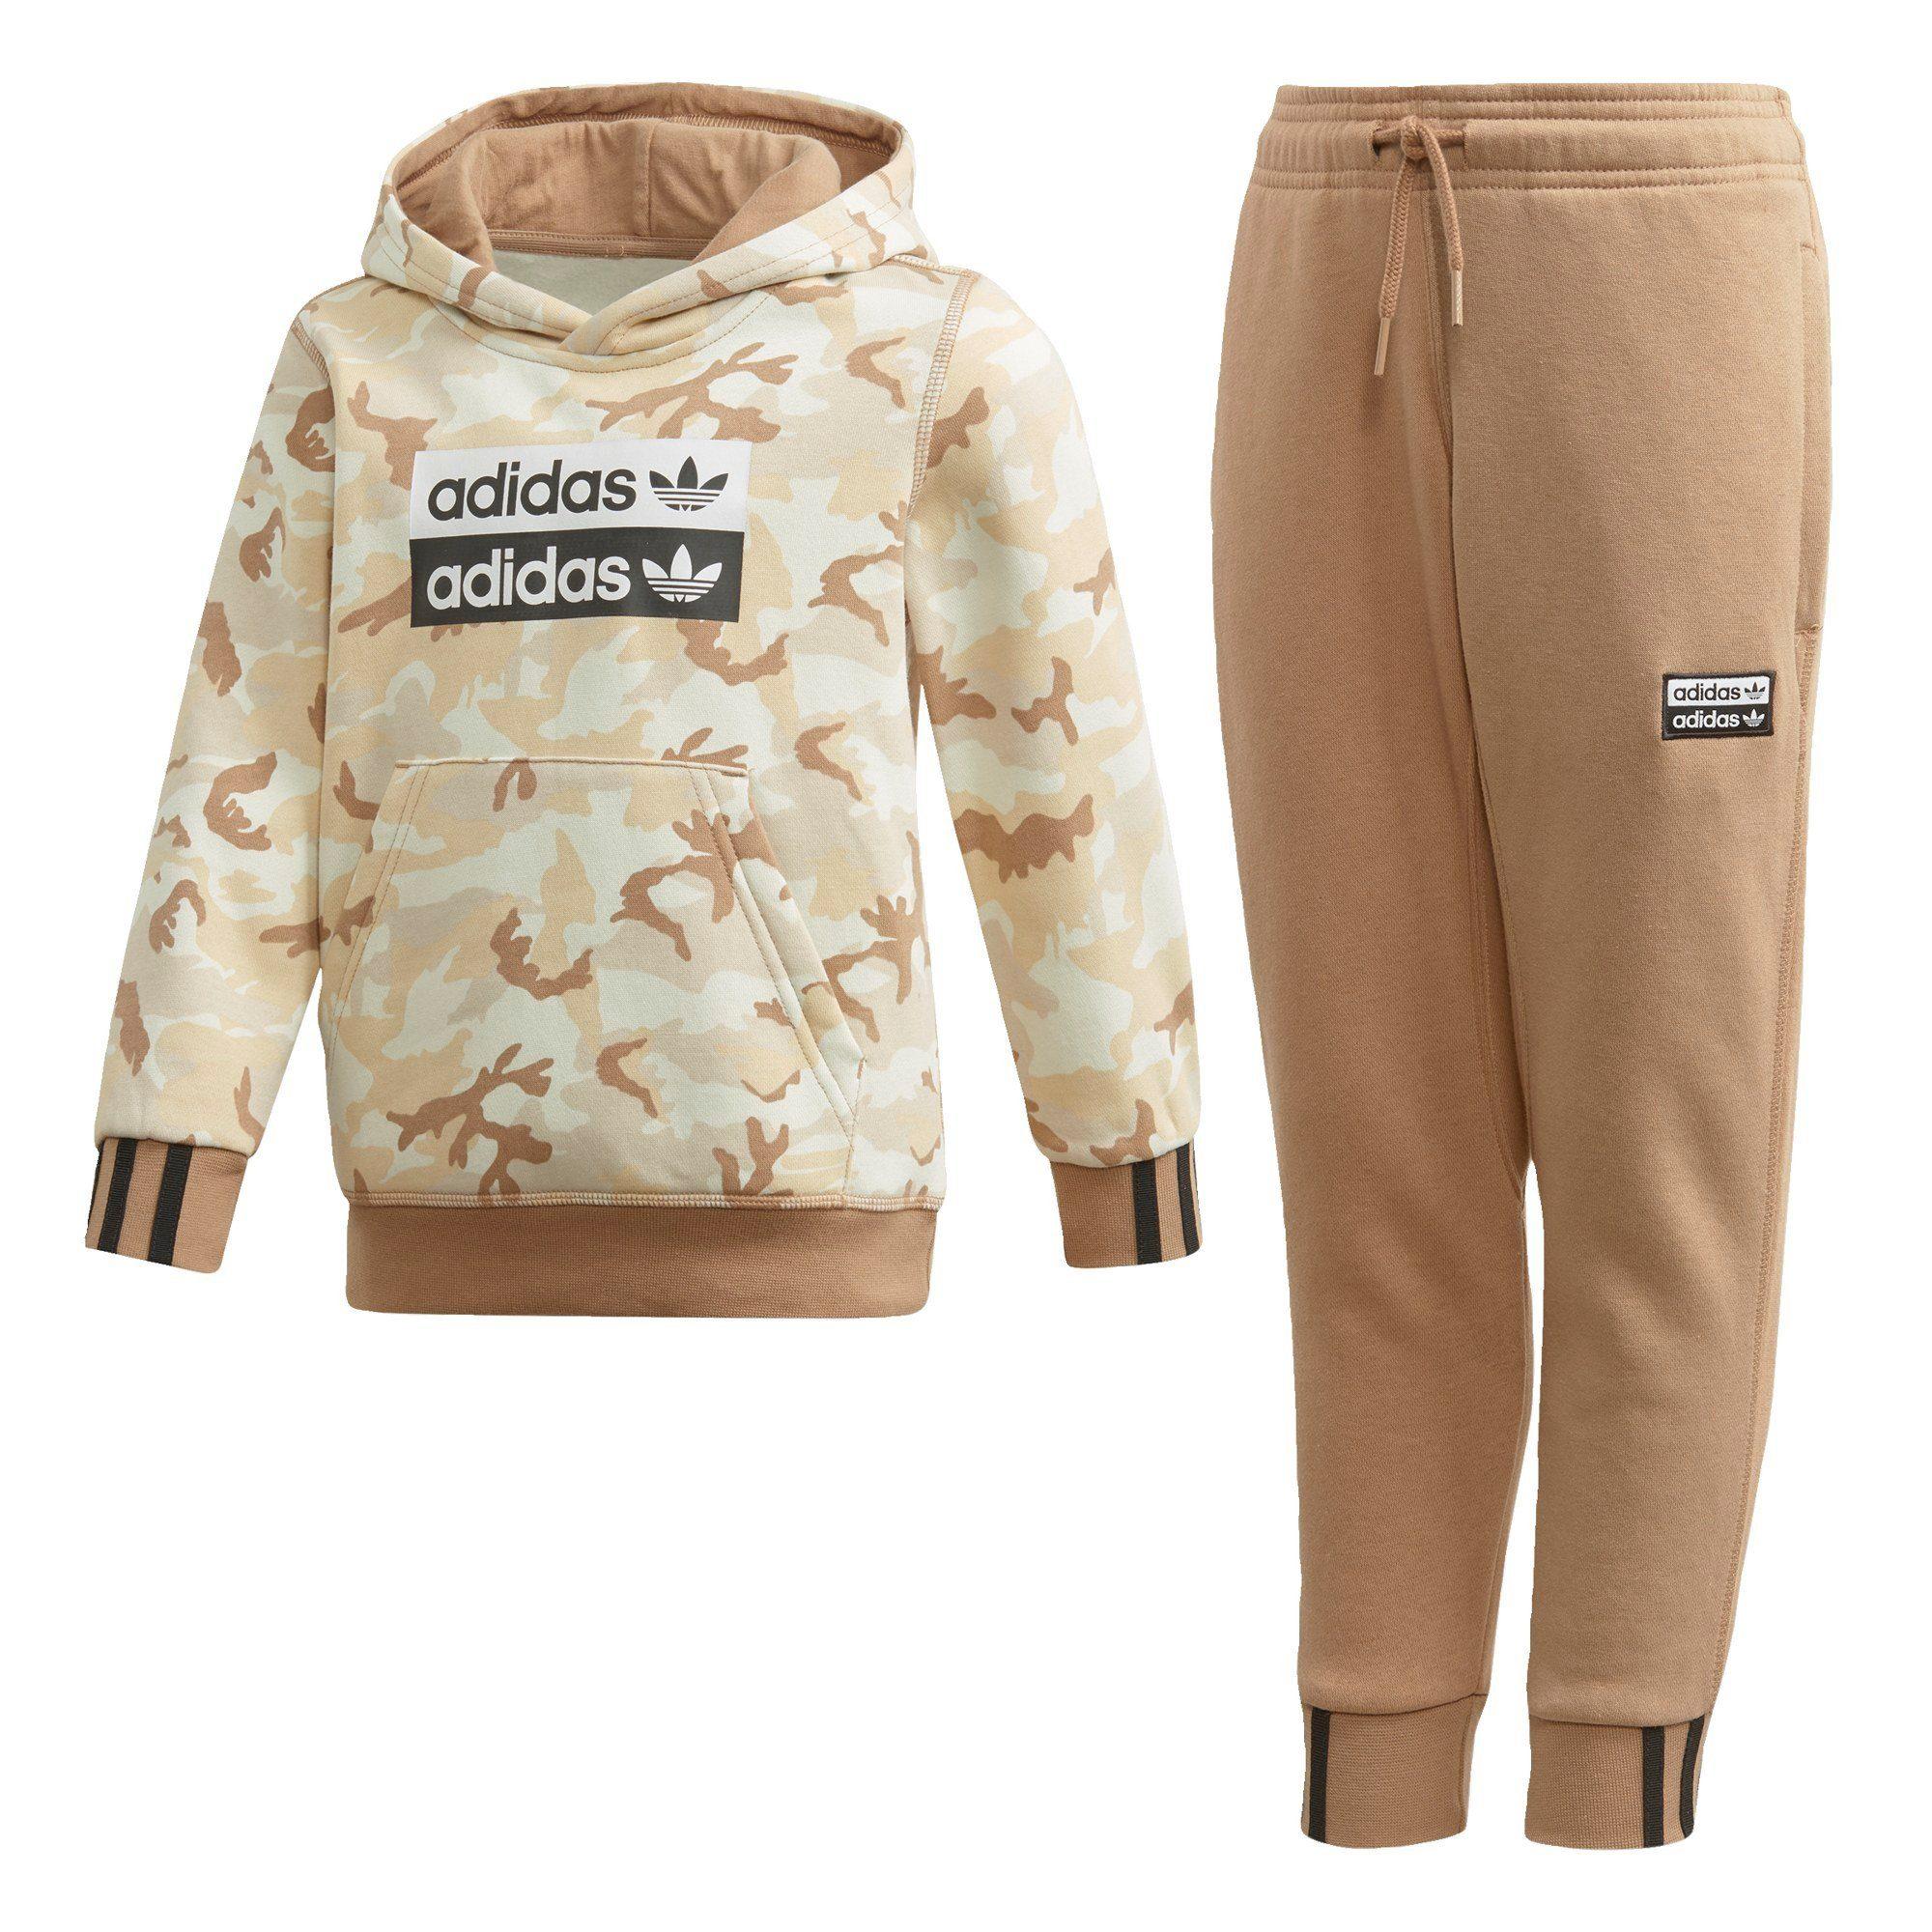 adidas Originals Trainingsanzug »R.Y.V. Camouflage Hoodie Set«, Ryv online kaufen | OTTO